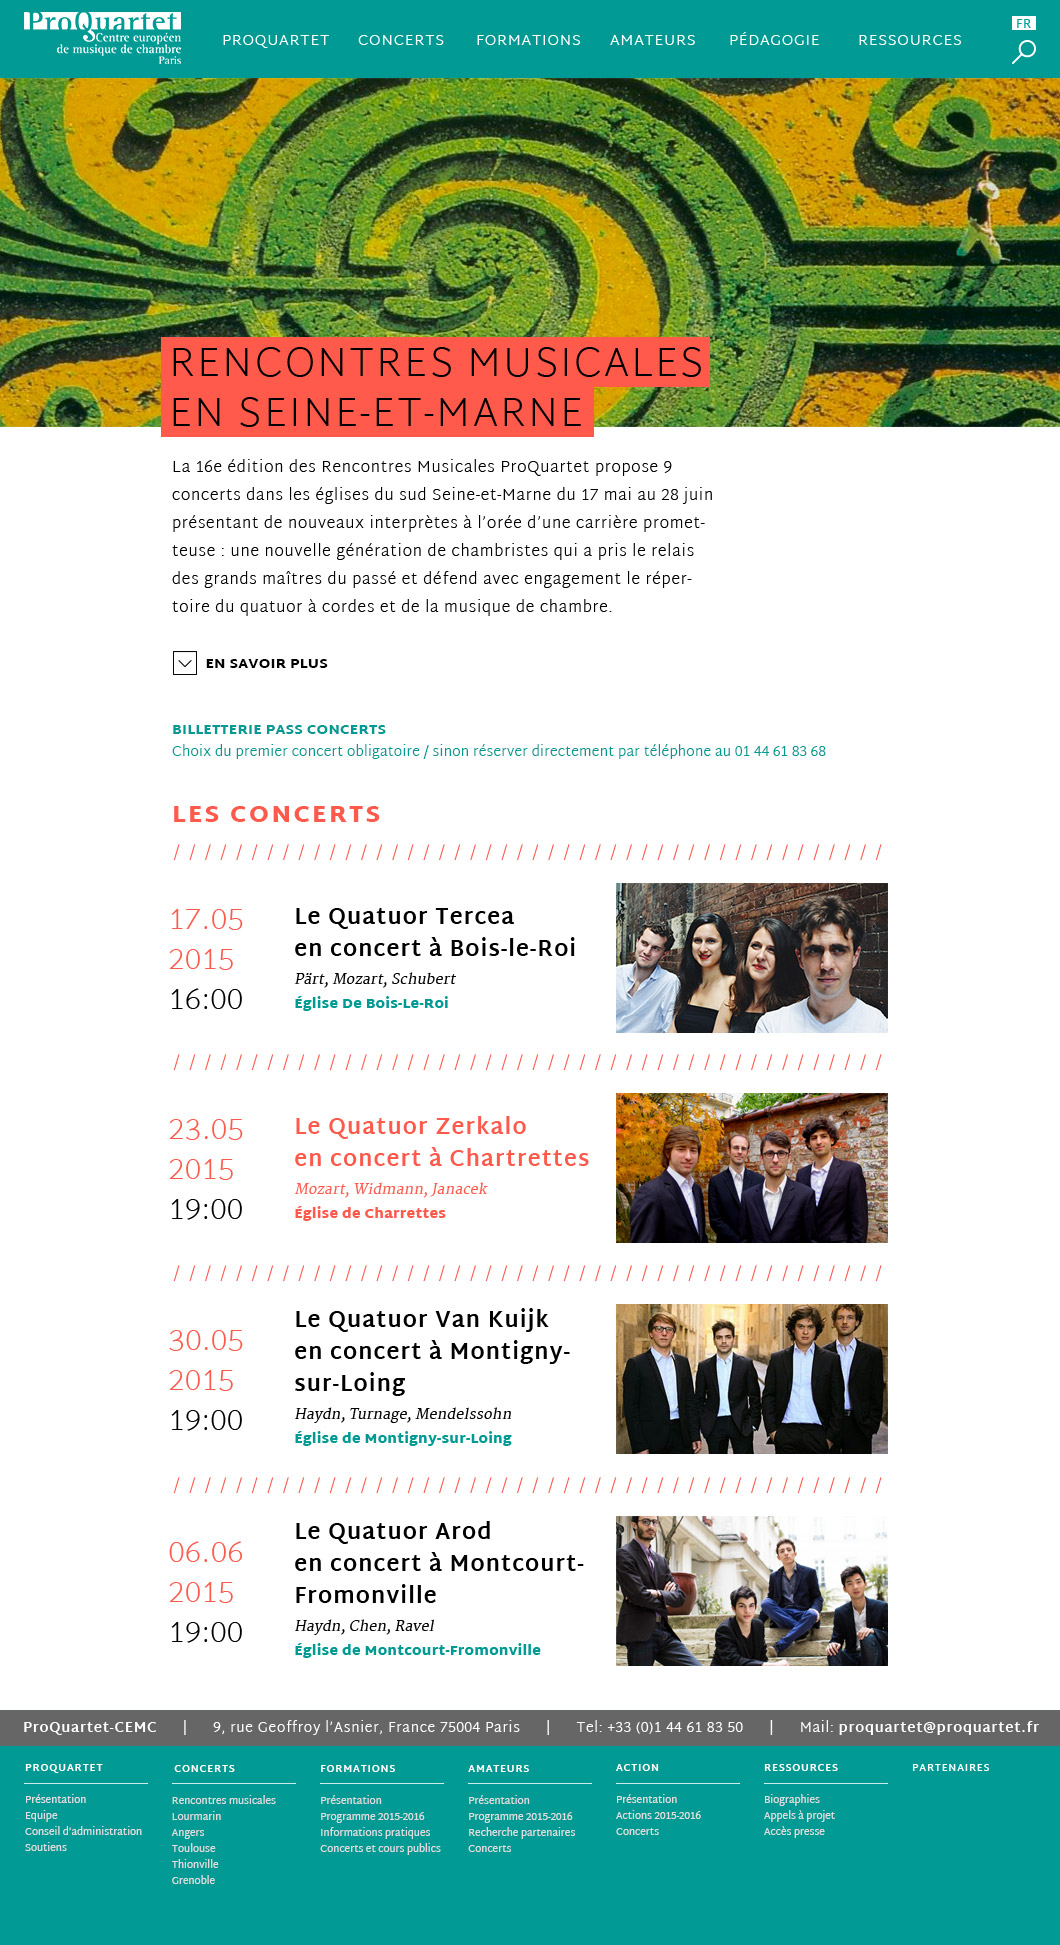 ProQ_Concerts.jpg